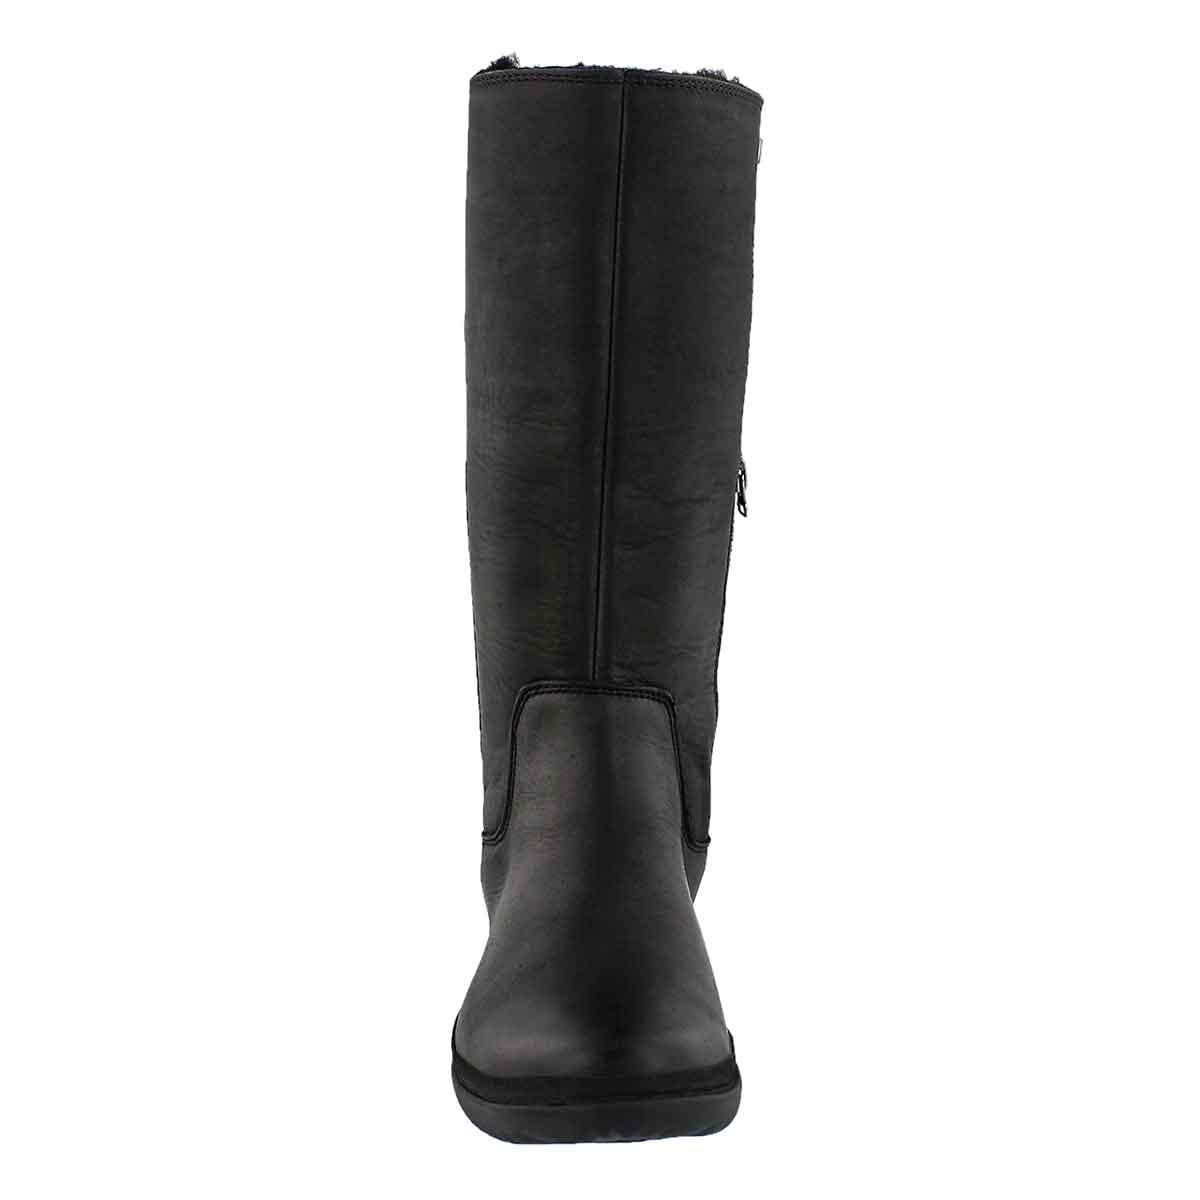 Lds Janina black wtpf knee high boot